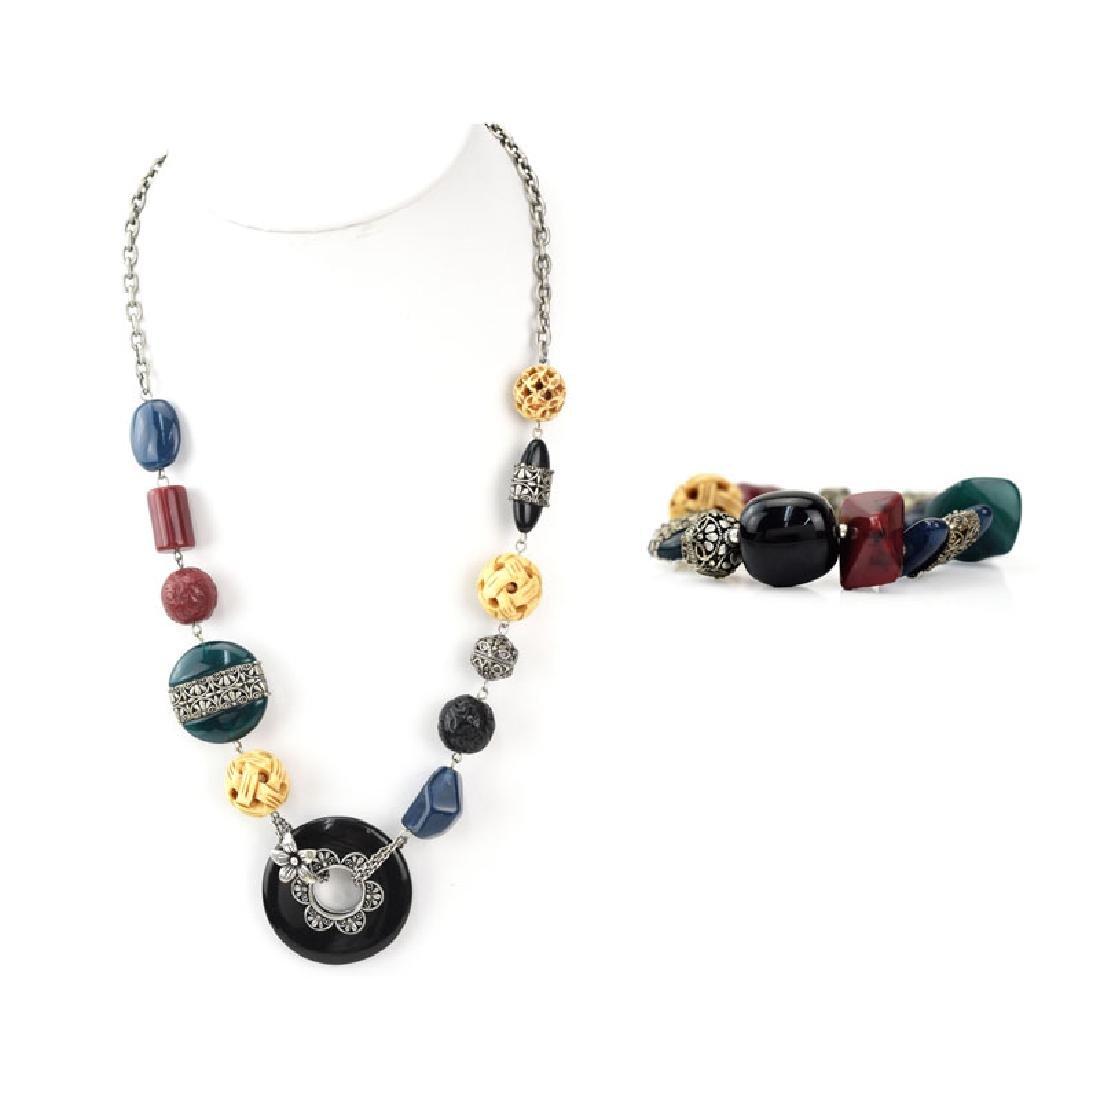 Two (2) Piece Chunky BoHo Style Necklace and Bracelet